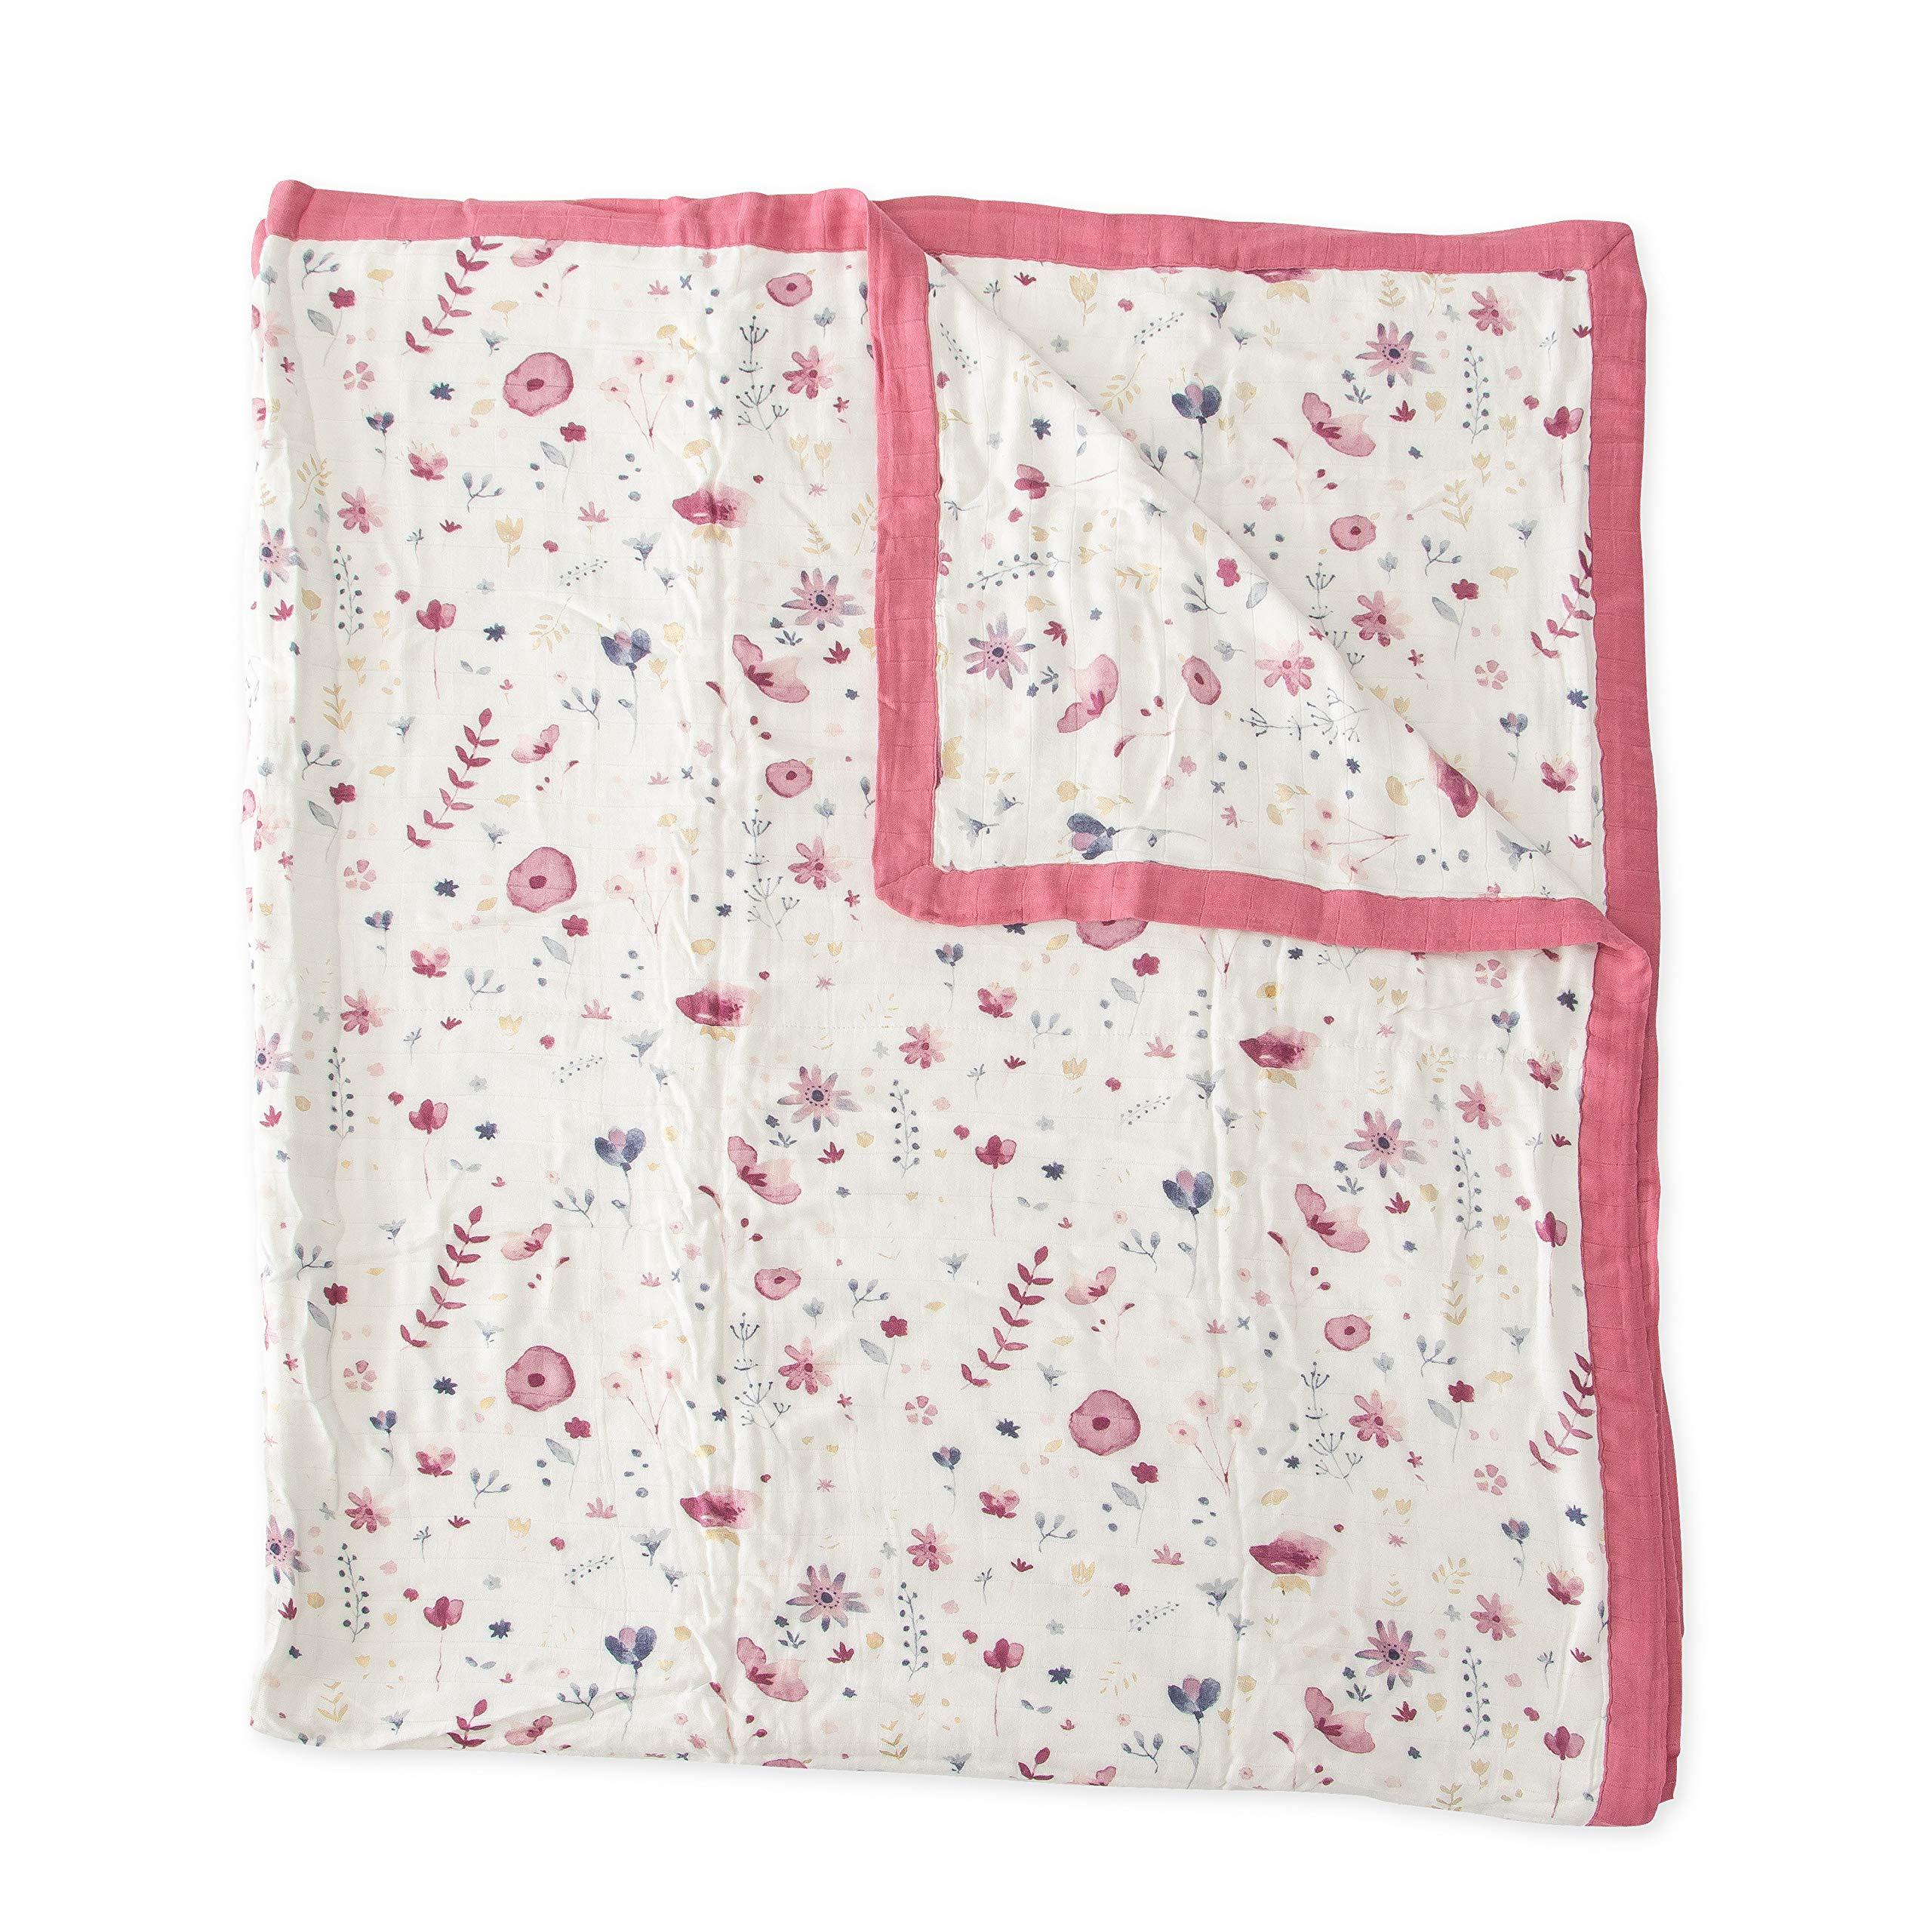 Little Unicorn Extra Soft Deluxe Muslin Large Quilt Blanket - Fairy Garden by Little Unicorn